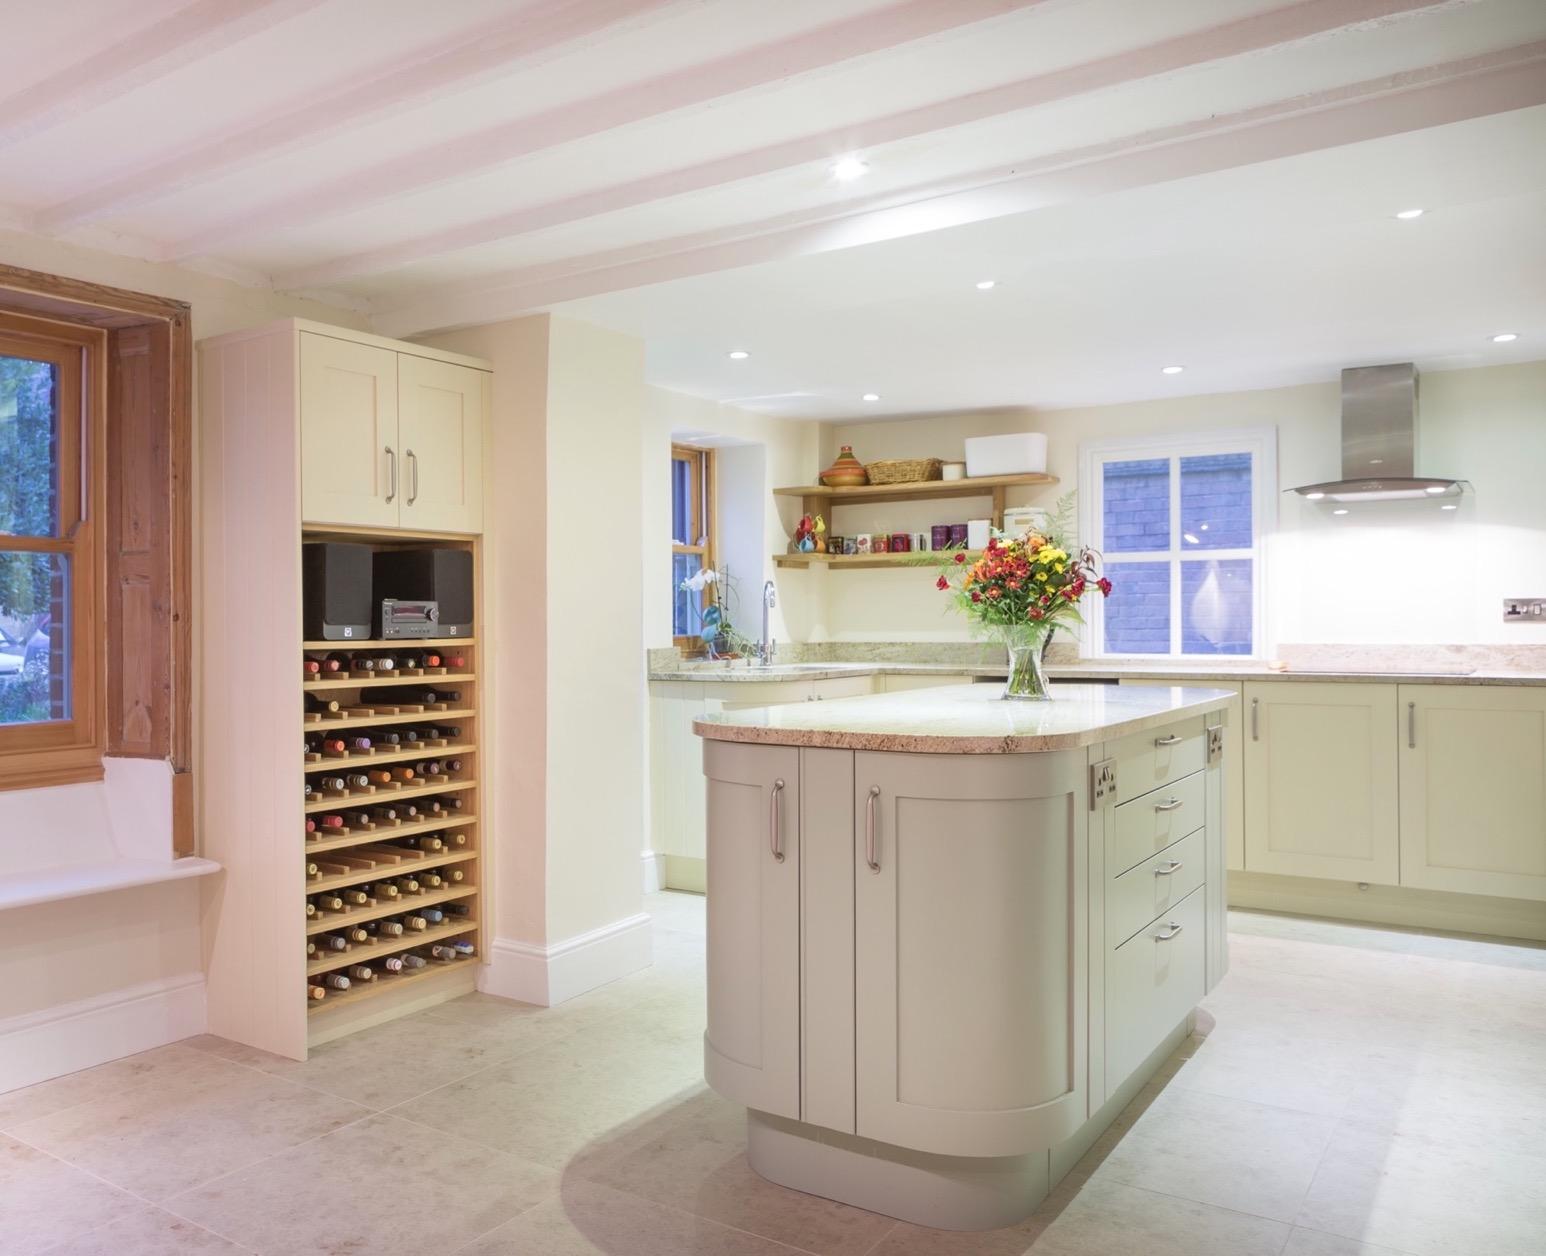 bespoke wine storage handpainted kitchen with